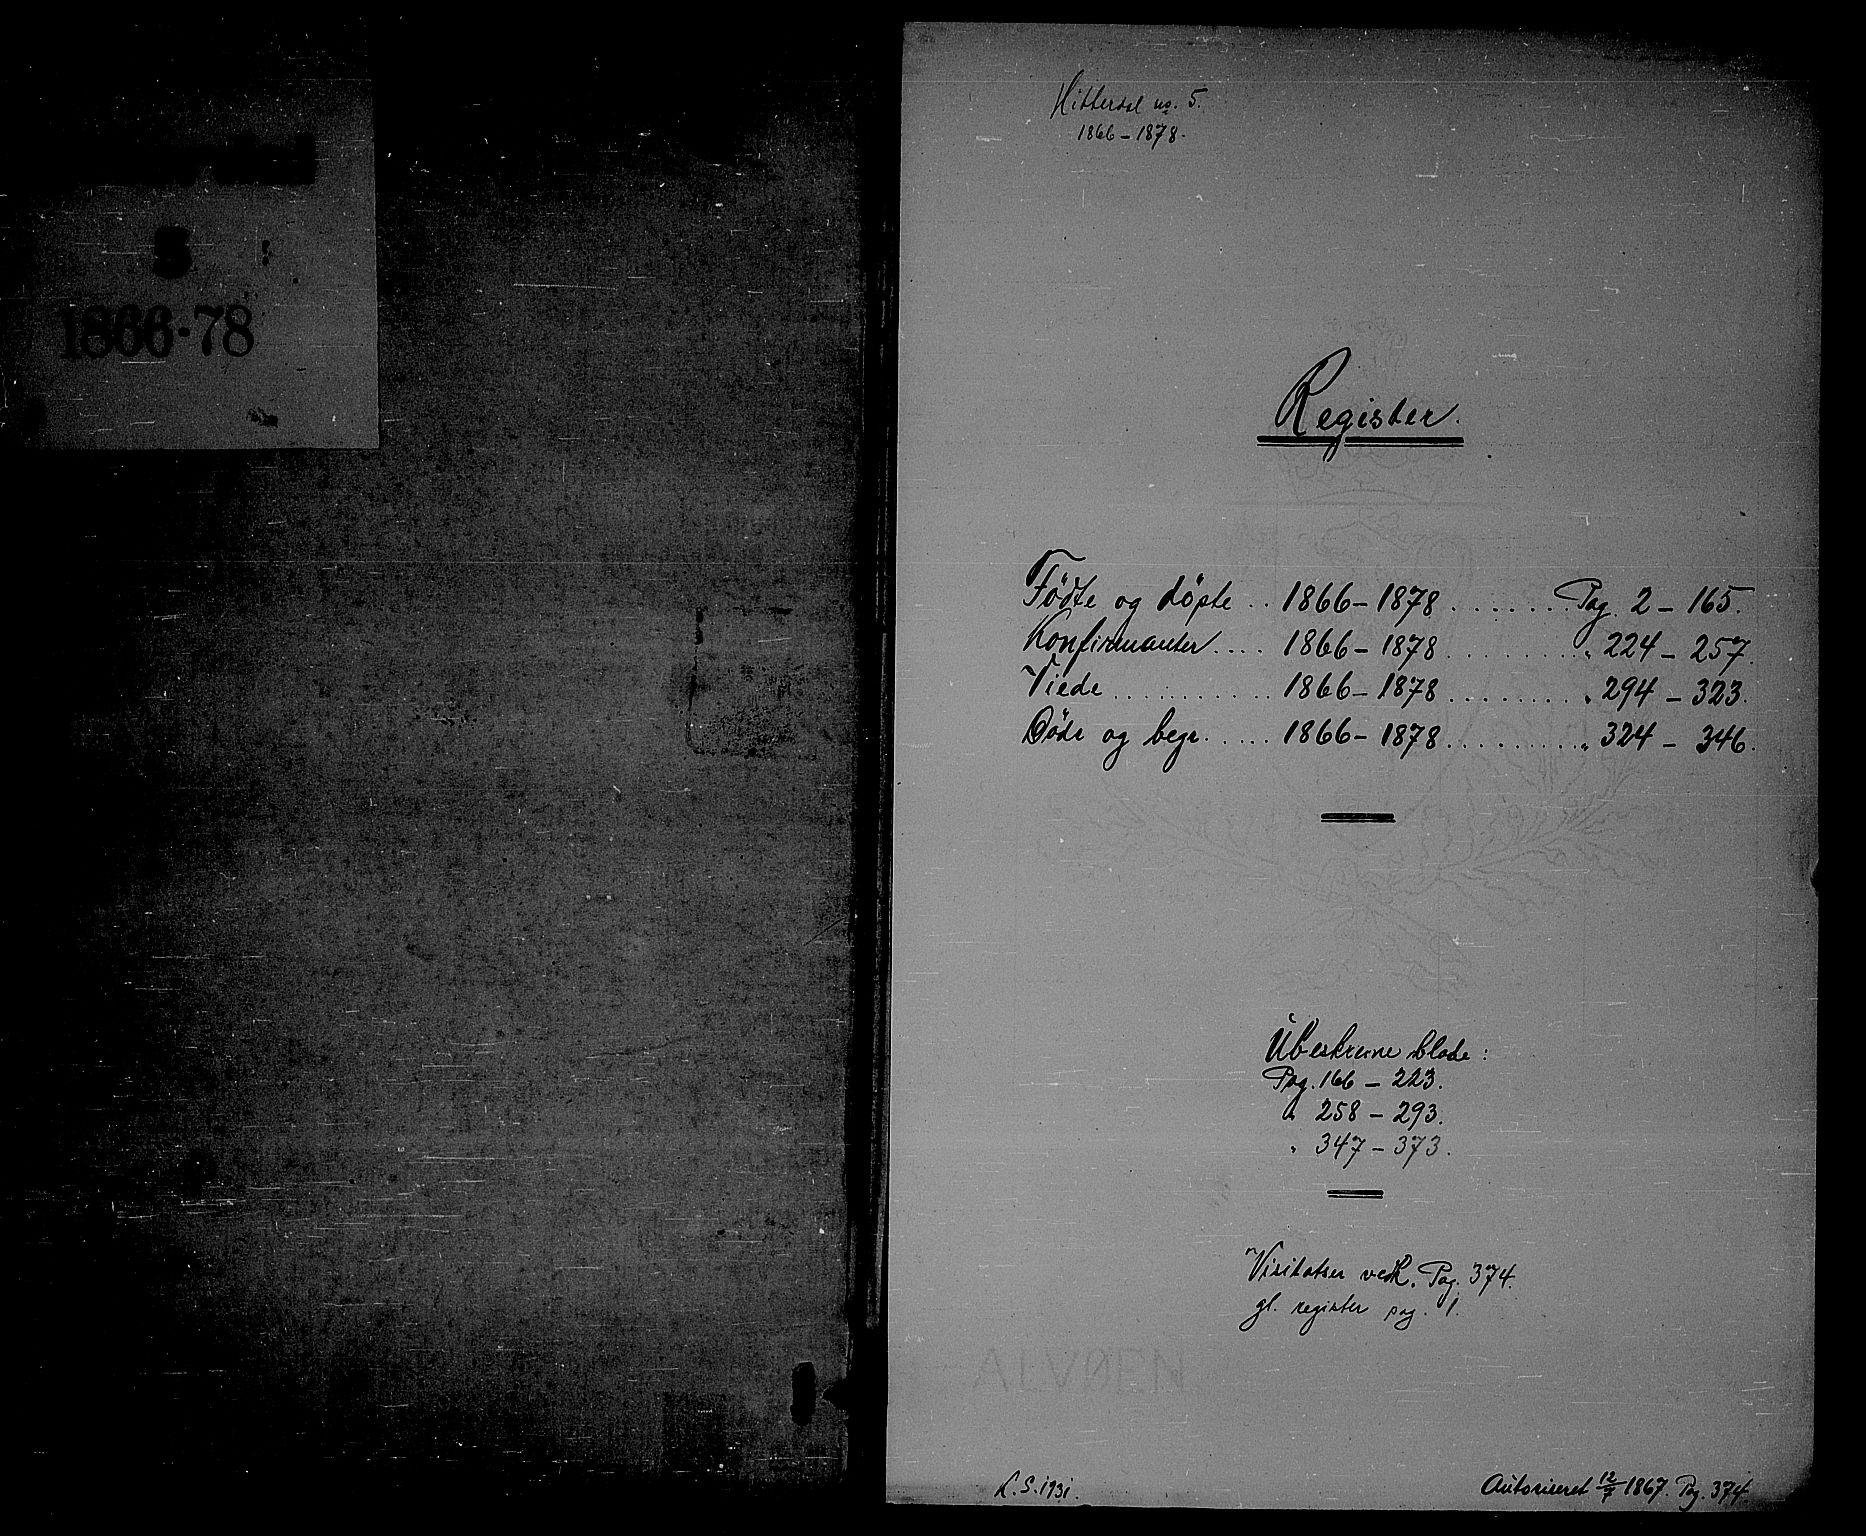 SAKO, Heddal kirkebøker, G/Ga/L0001: Klokkerbok nr. I 1, 1866-1878